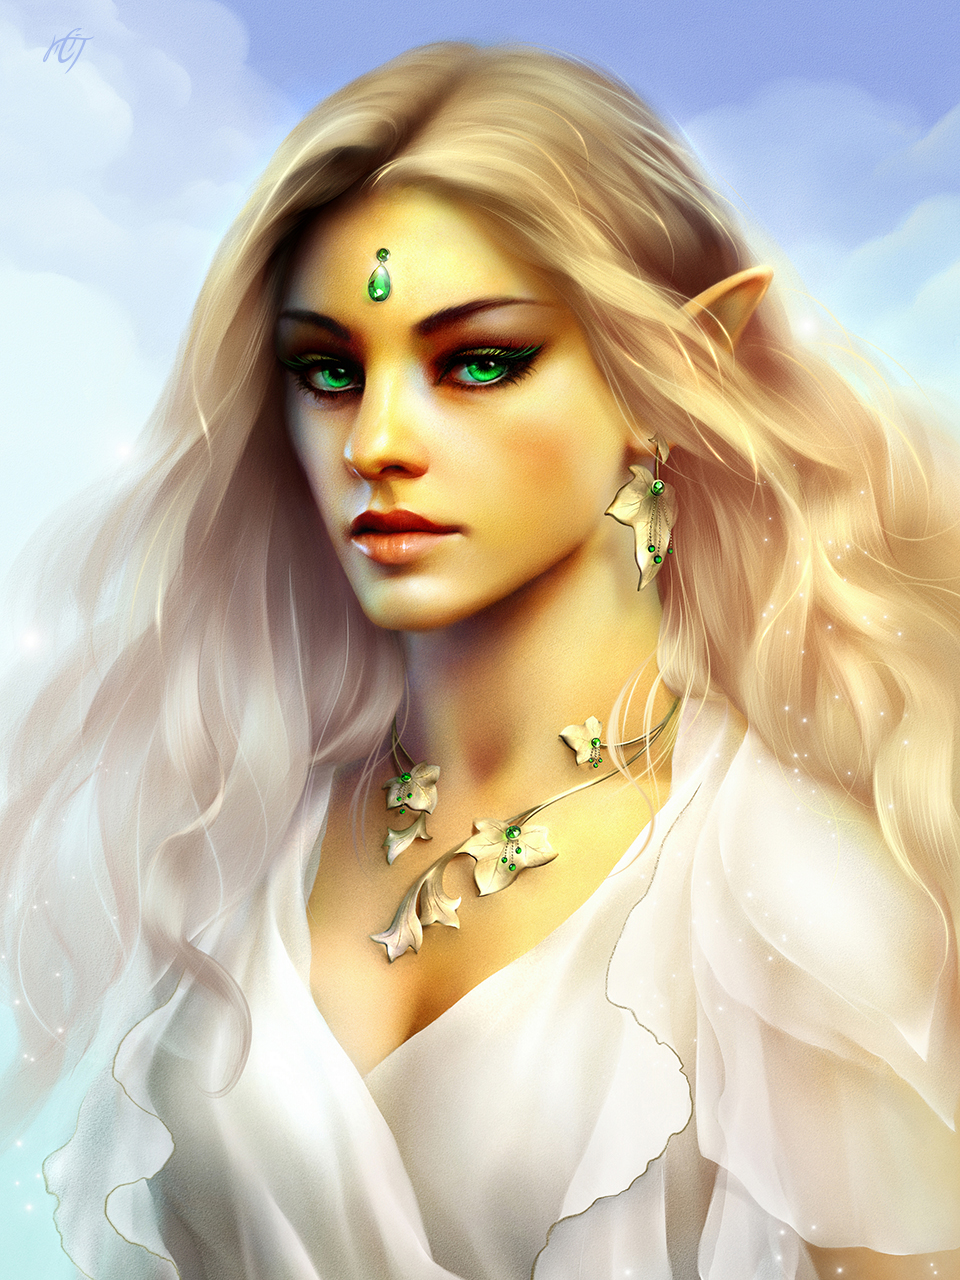 Commission: Tiyra.